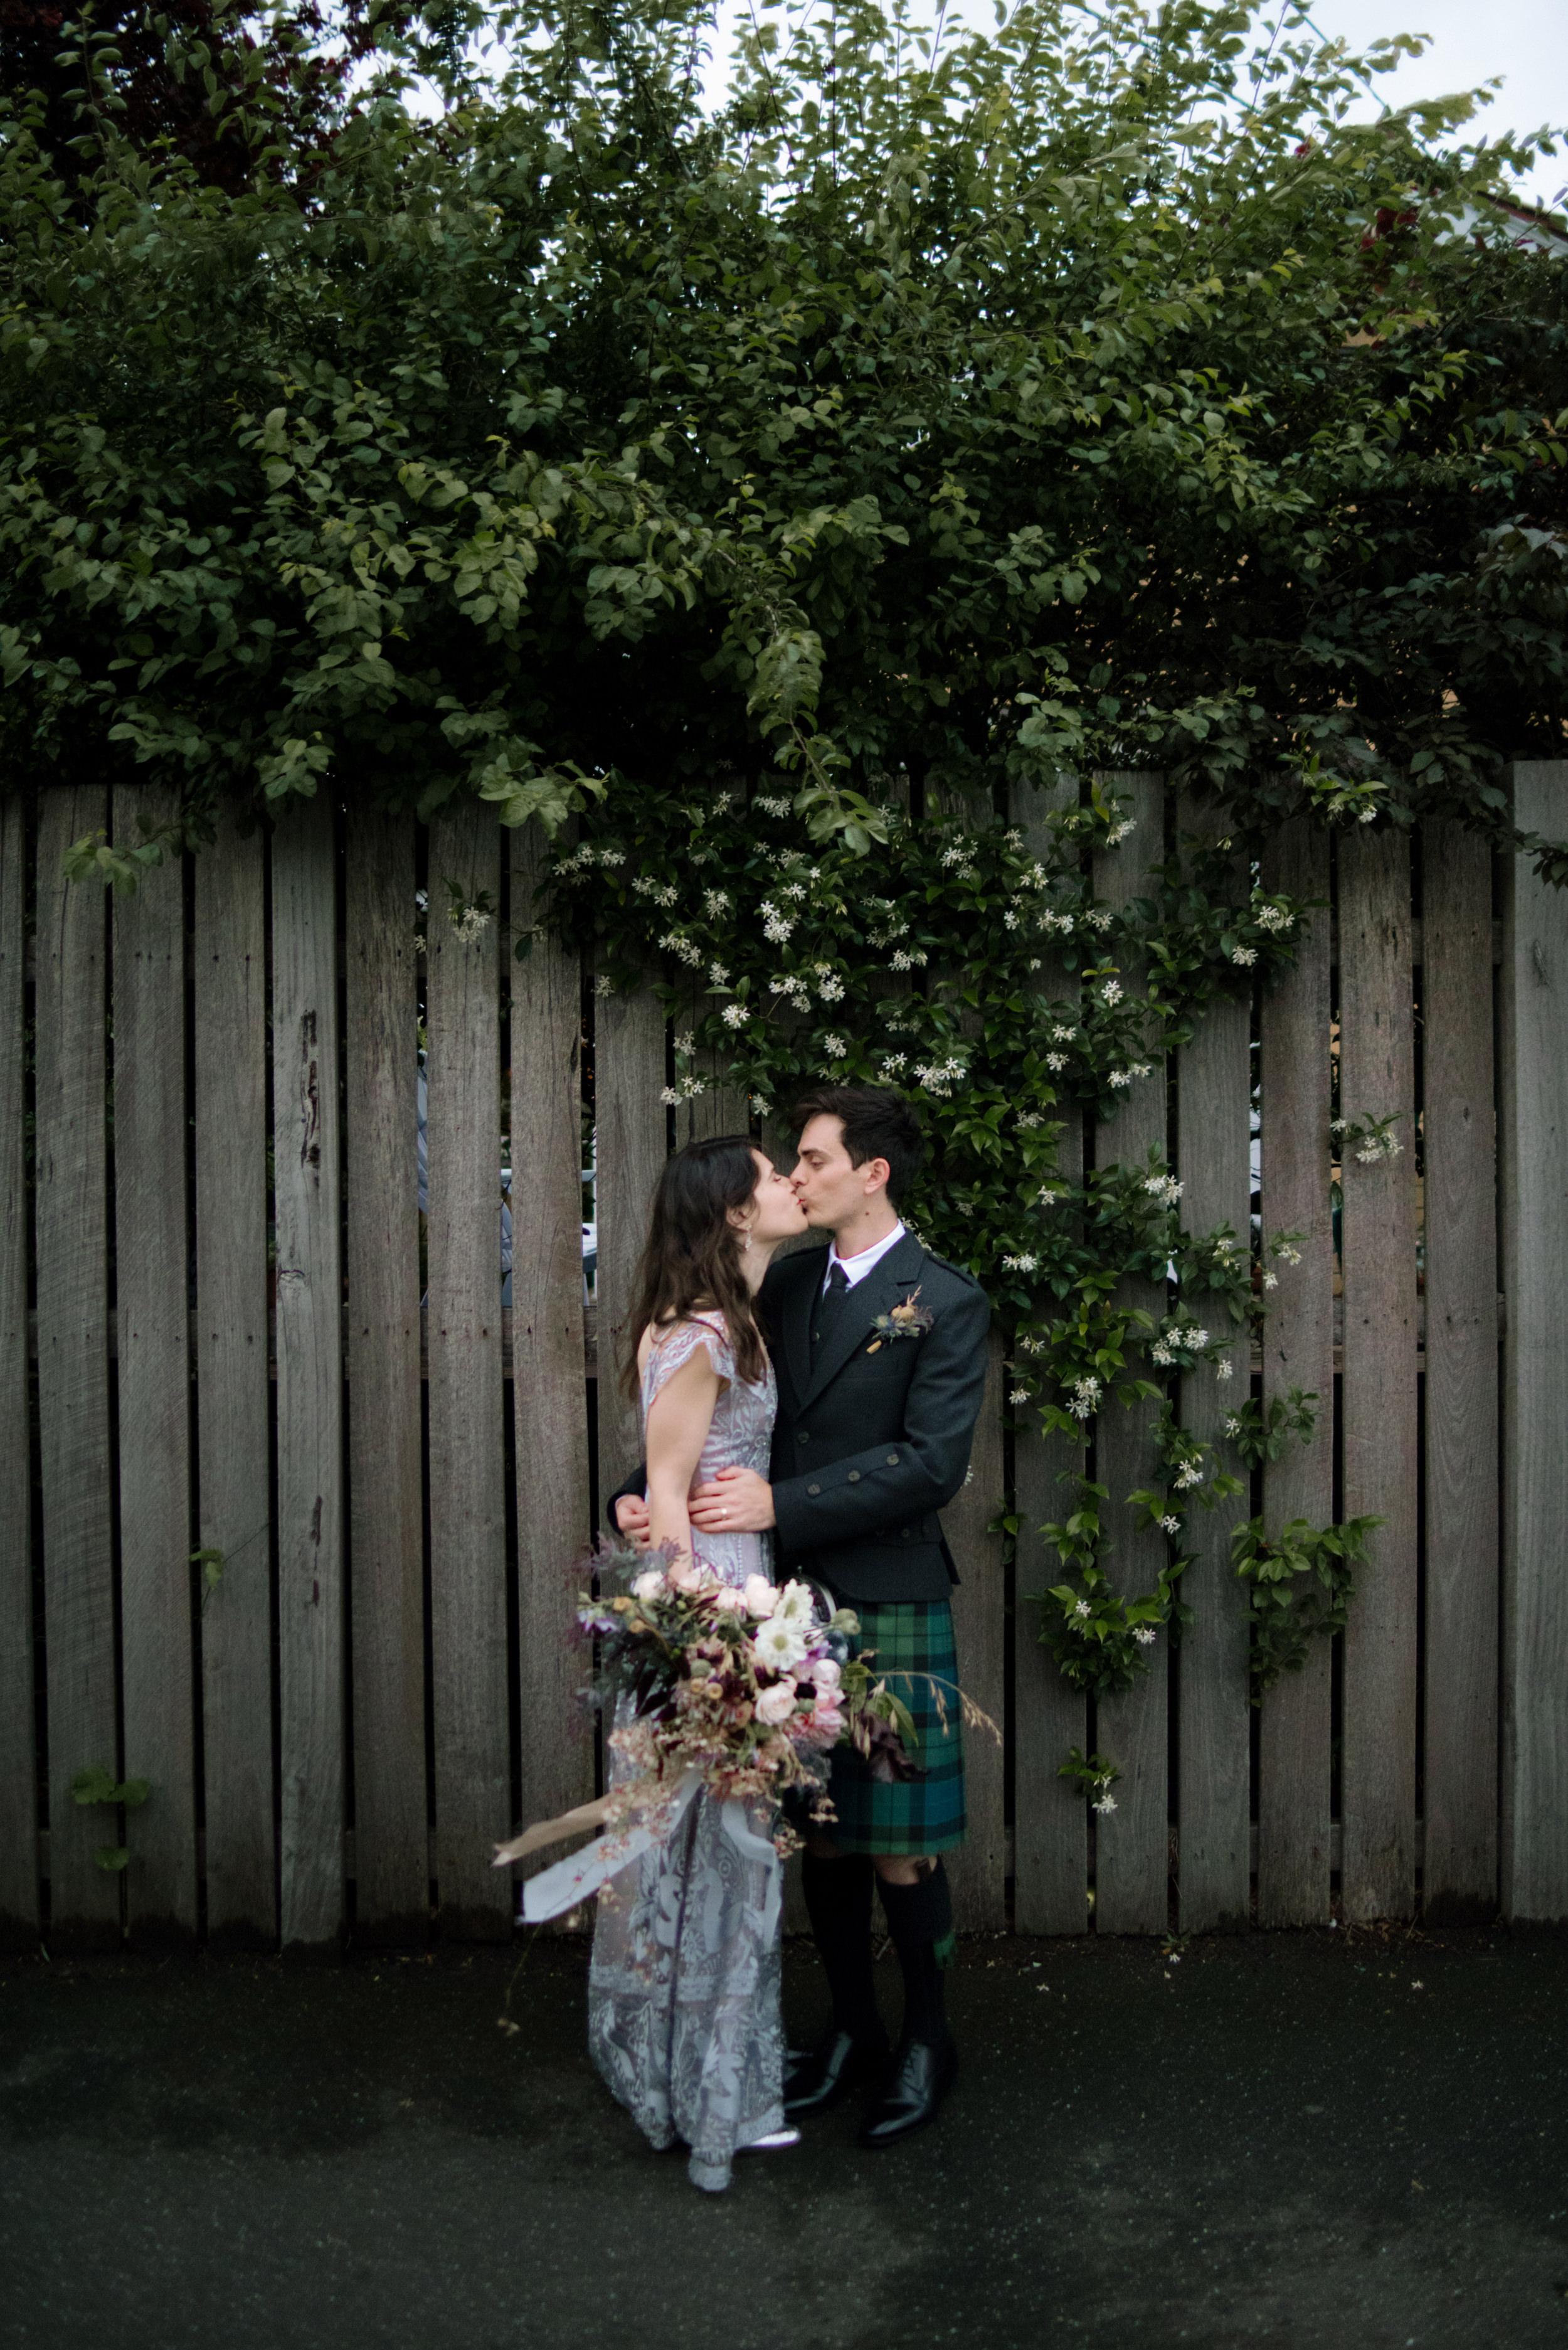 I-Got-You-Babe-&.Co.-Glasshaus-Wedding-Charlotte-Cameron0114.JPG